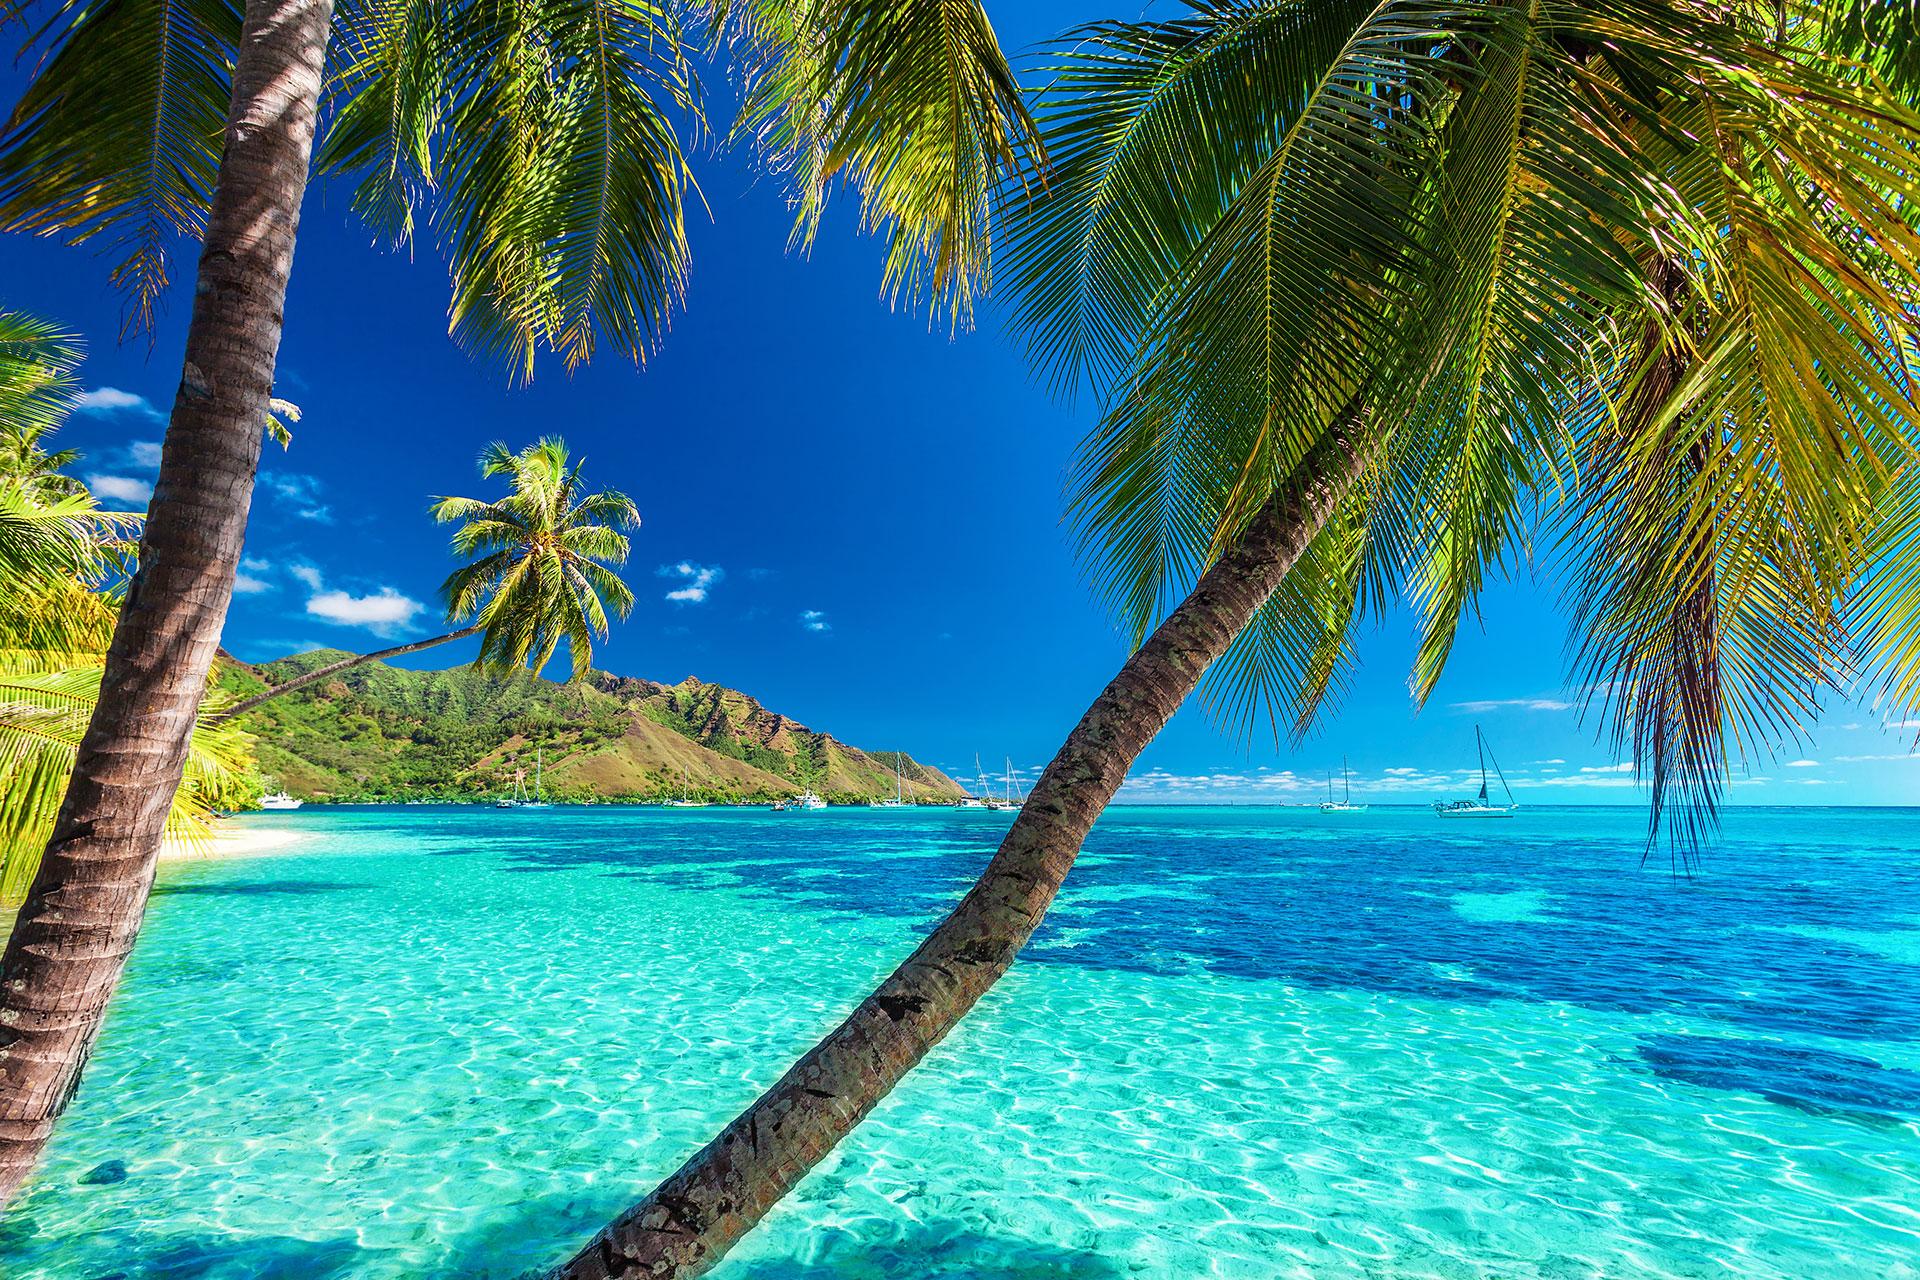 Blue waters in Tahiti